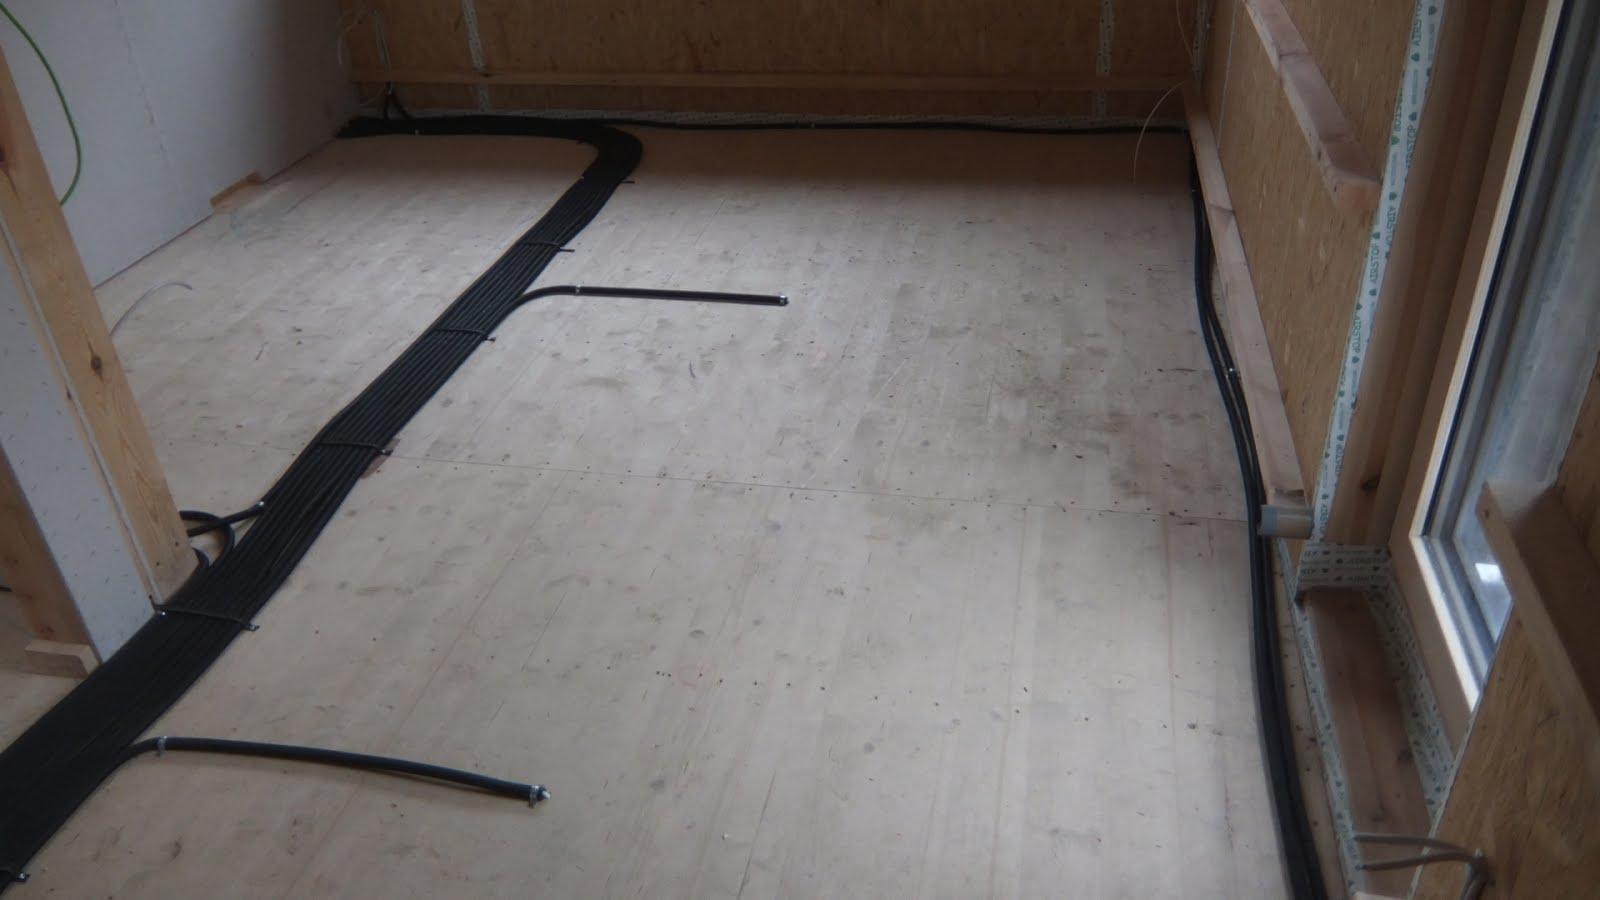 AuA\'s Baublog: Elektro-Verkabelung (Hohlwandinstallation) fertiggestellt